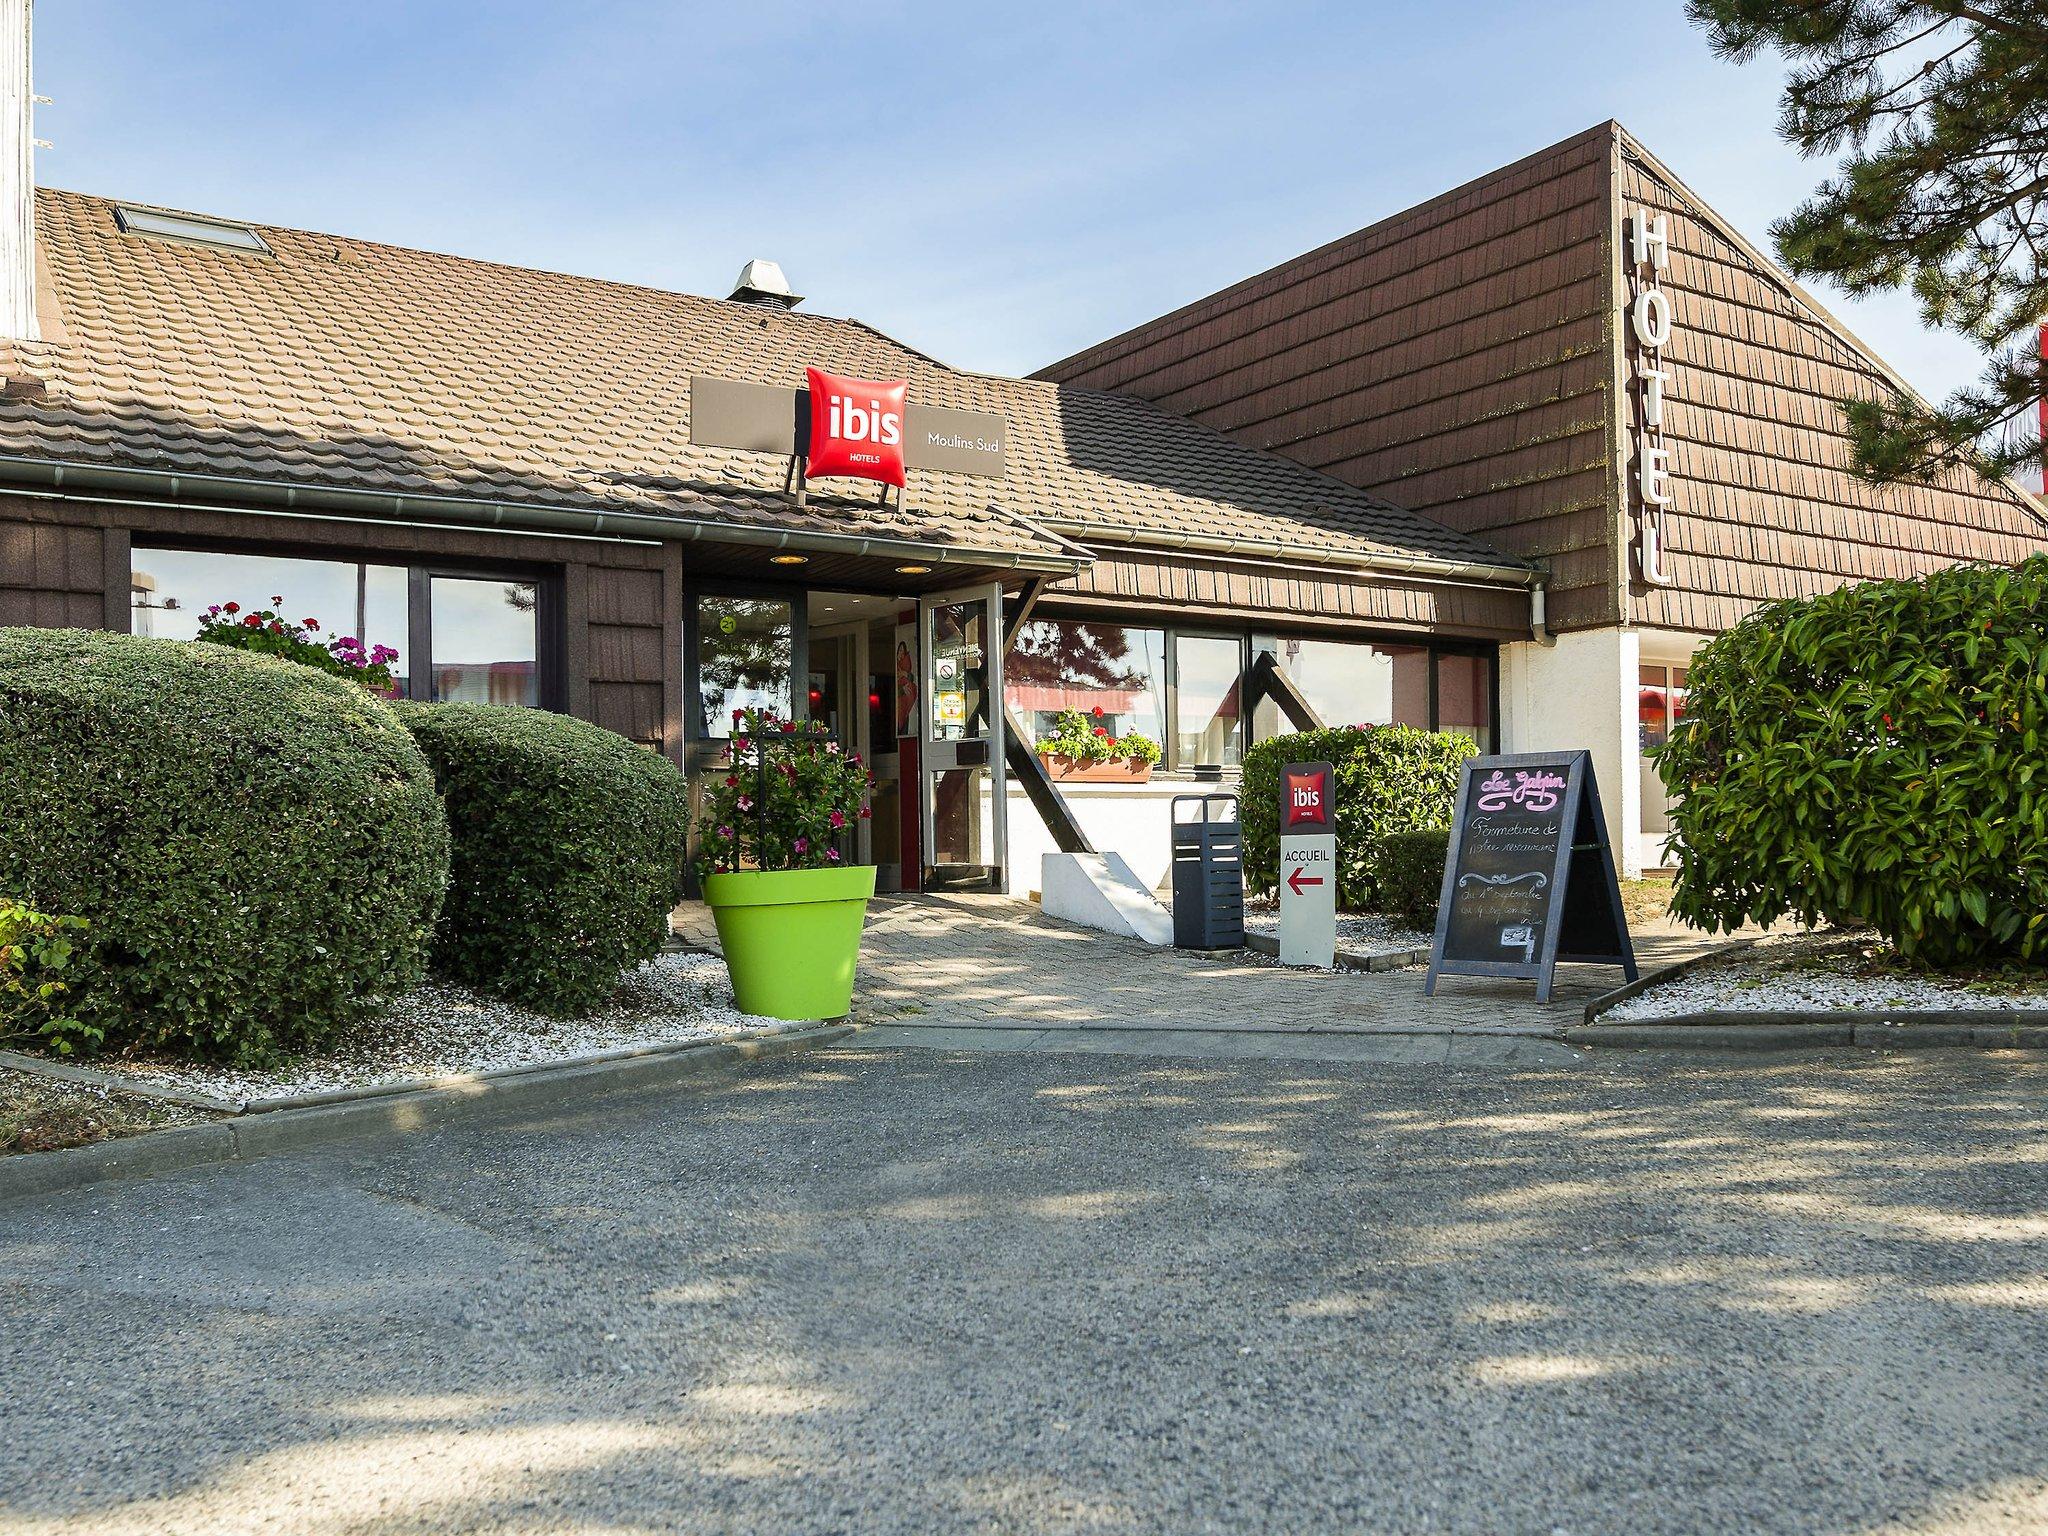 Ibis Hotel Moulins Sud